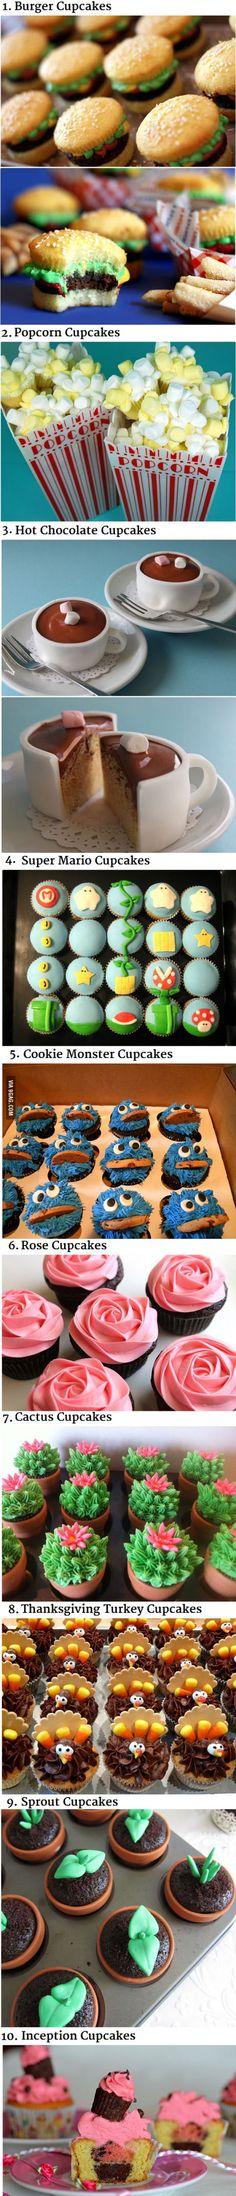 10 Awesome Cupcake Decorating Ideas..